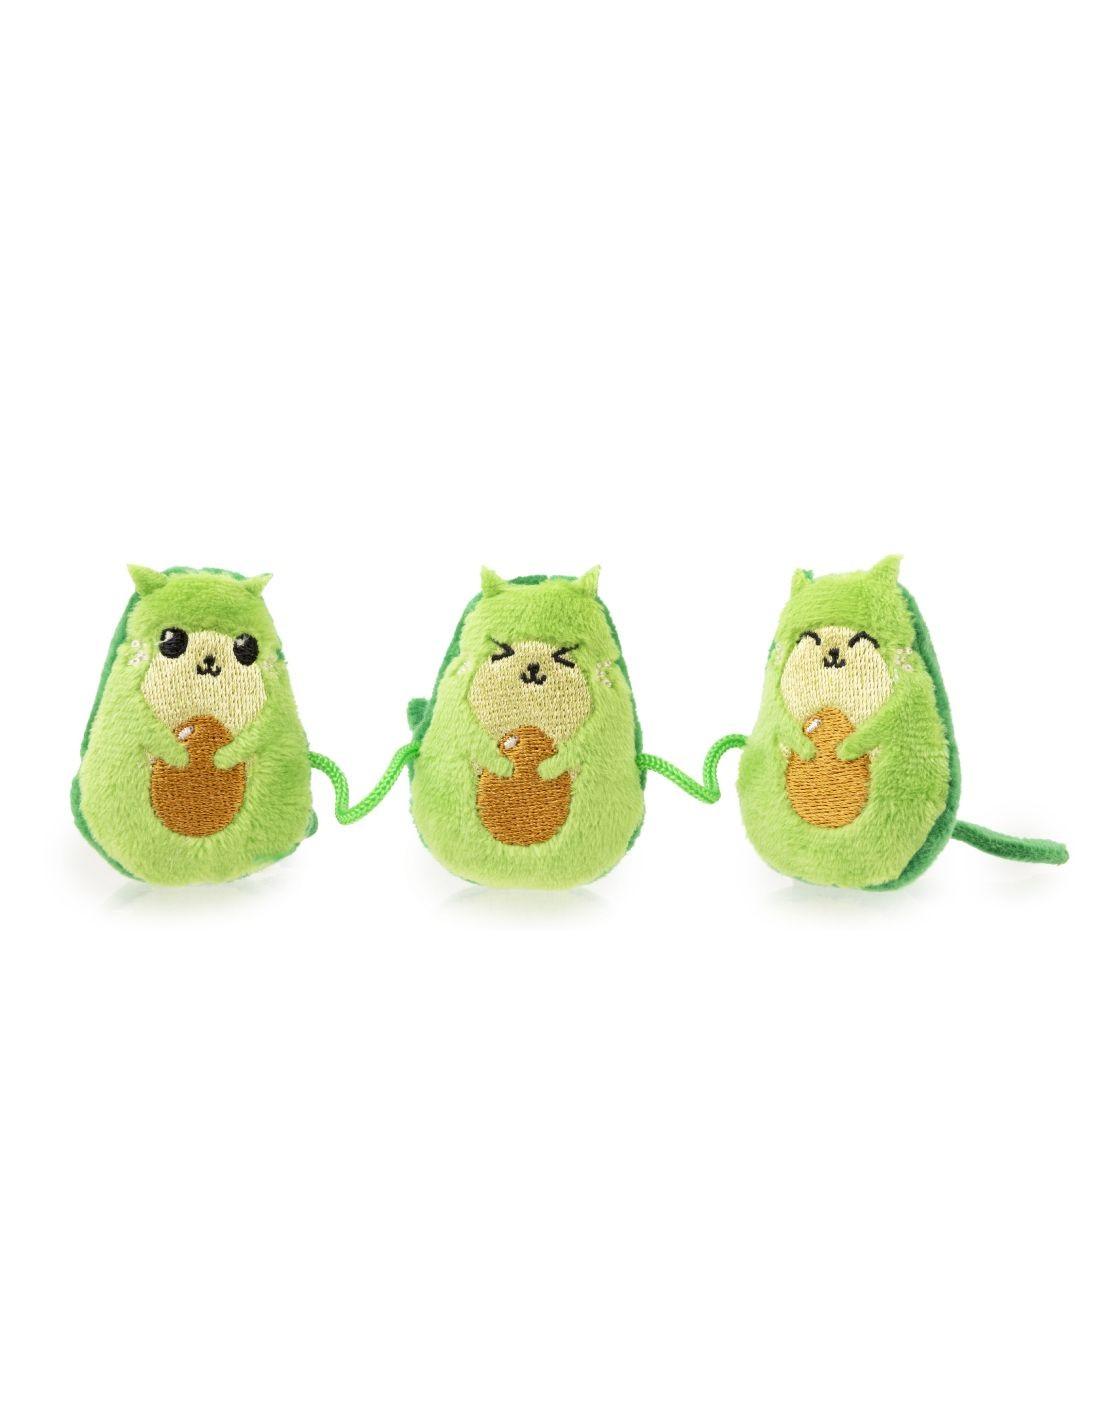 FUZZYARD Avocatos x3 - Juguete para gato